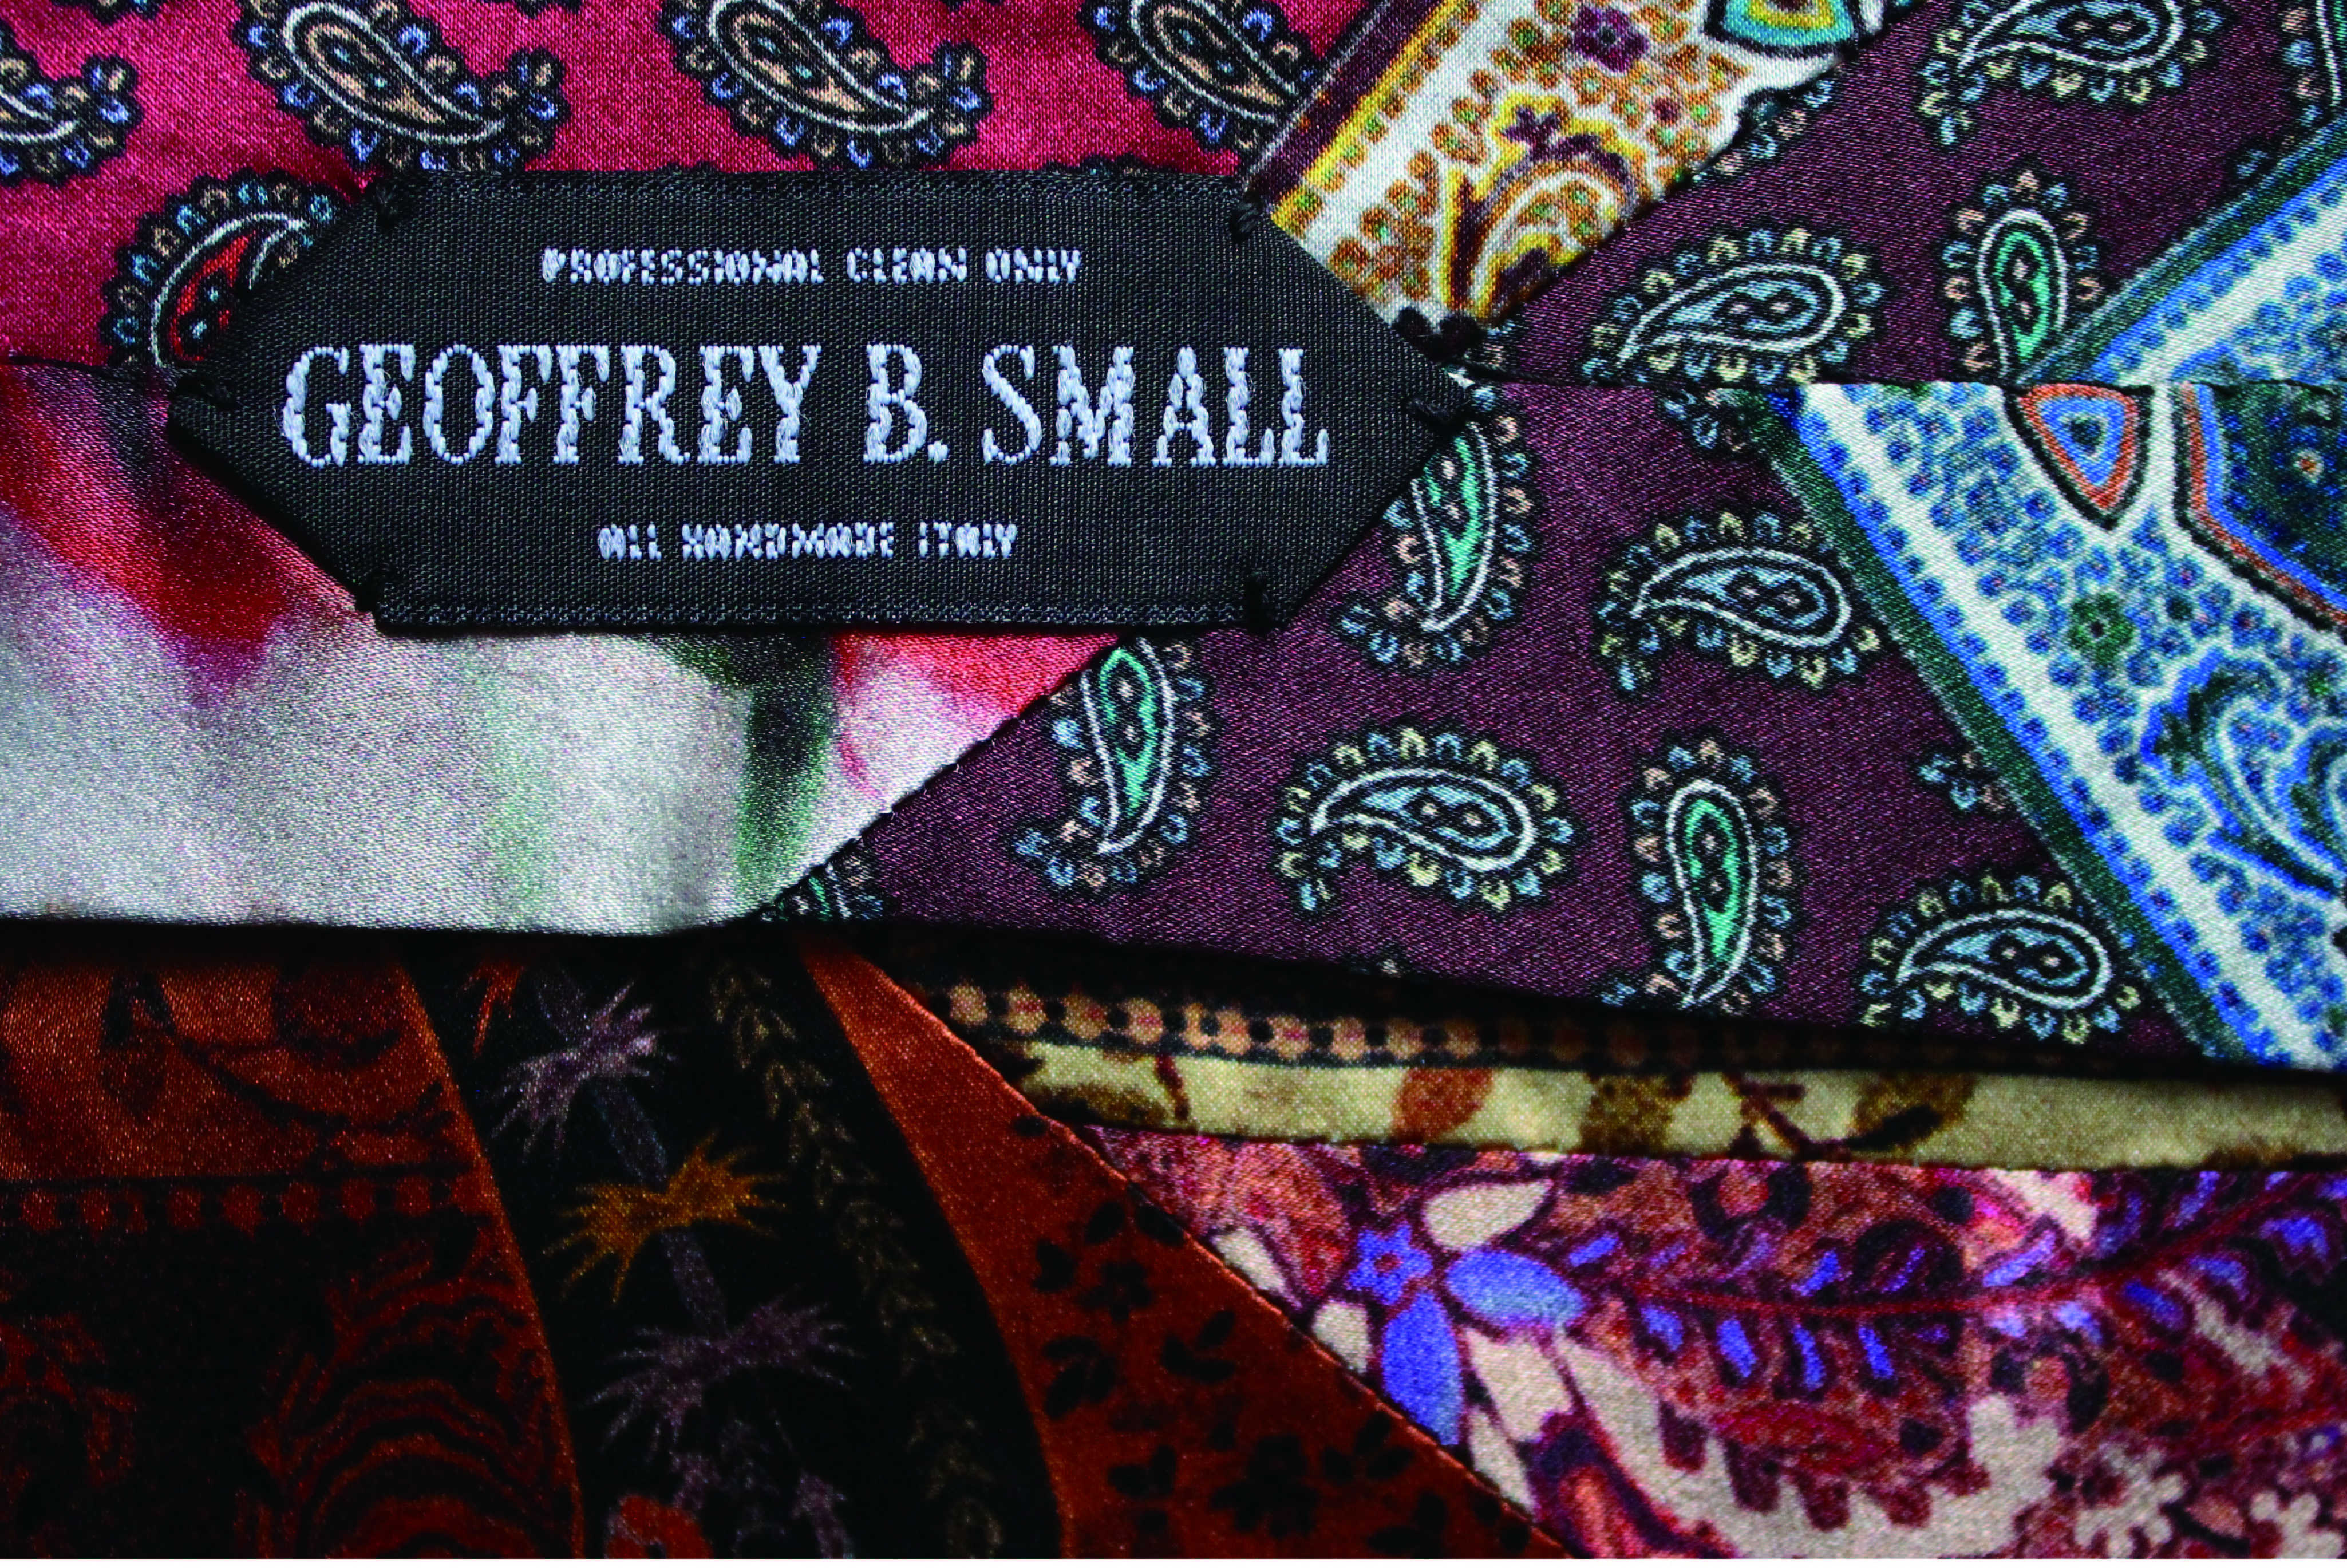 Geoffrey B.Small 2017A/W START 11.18